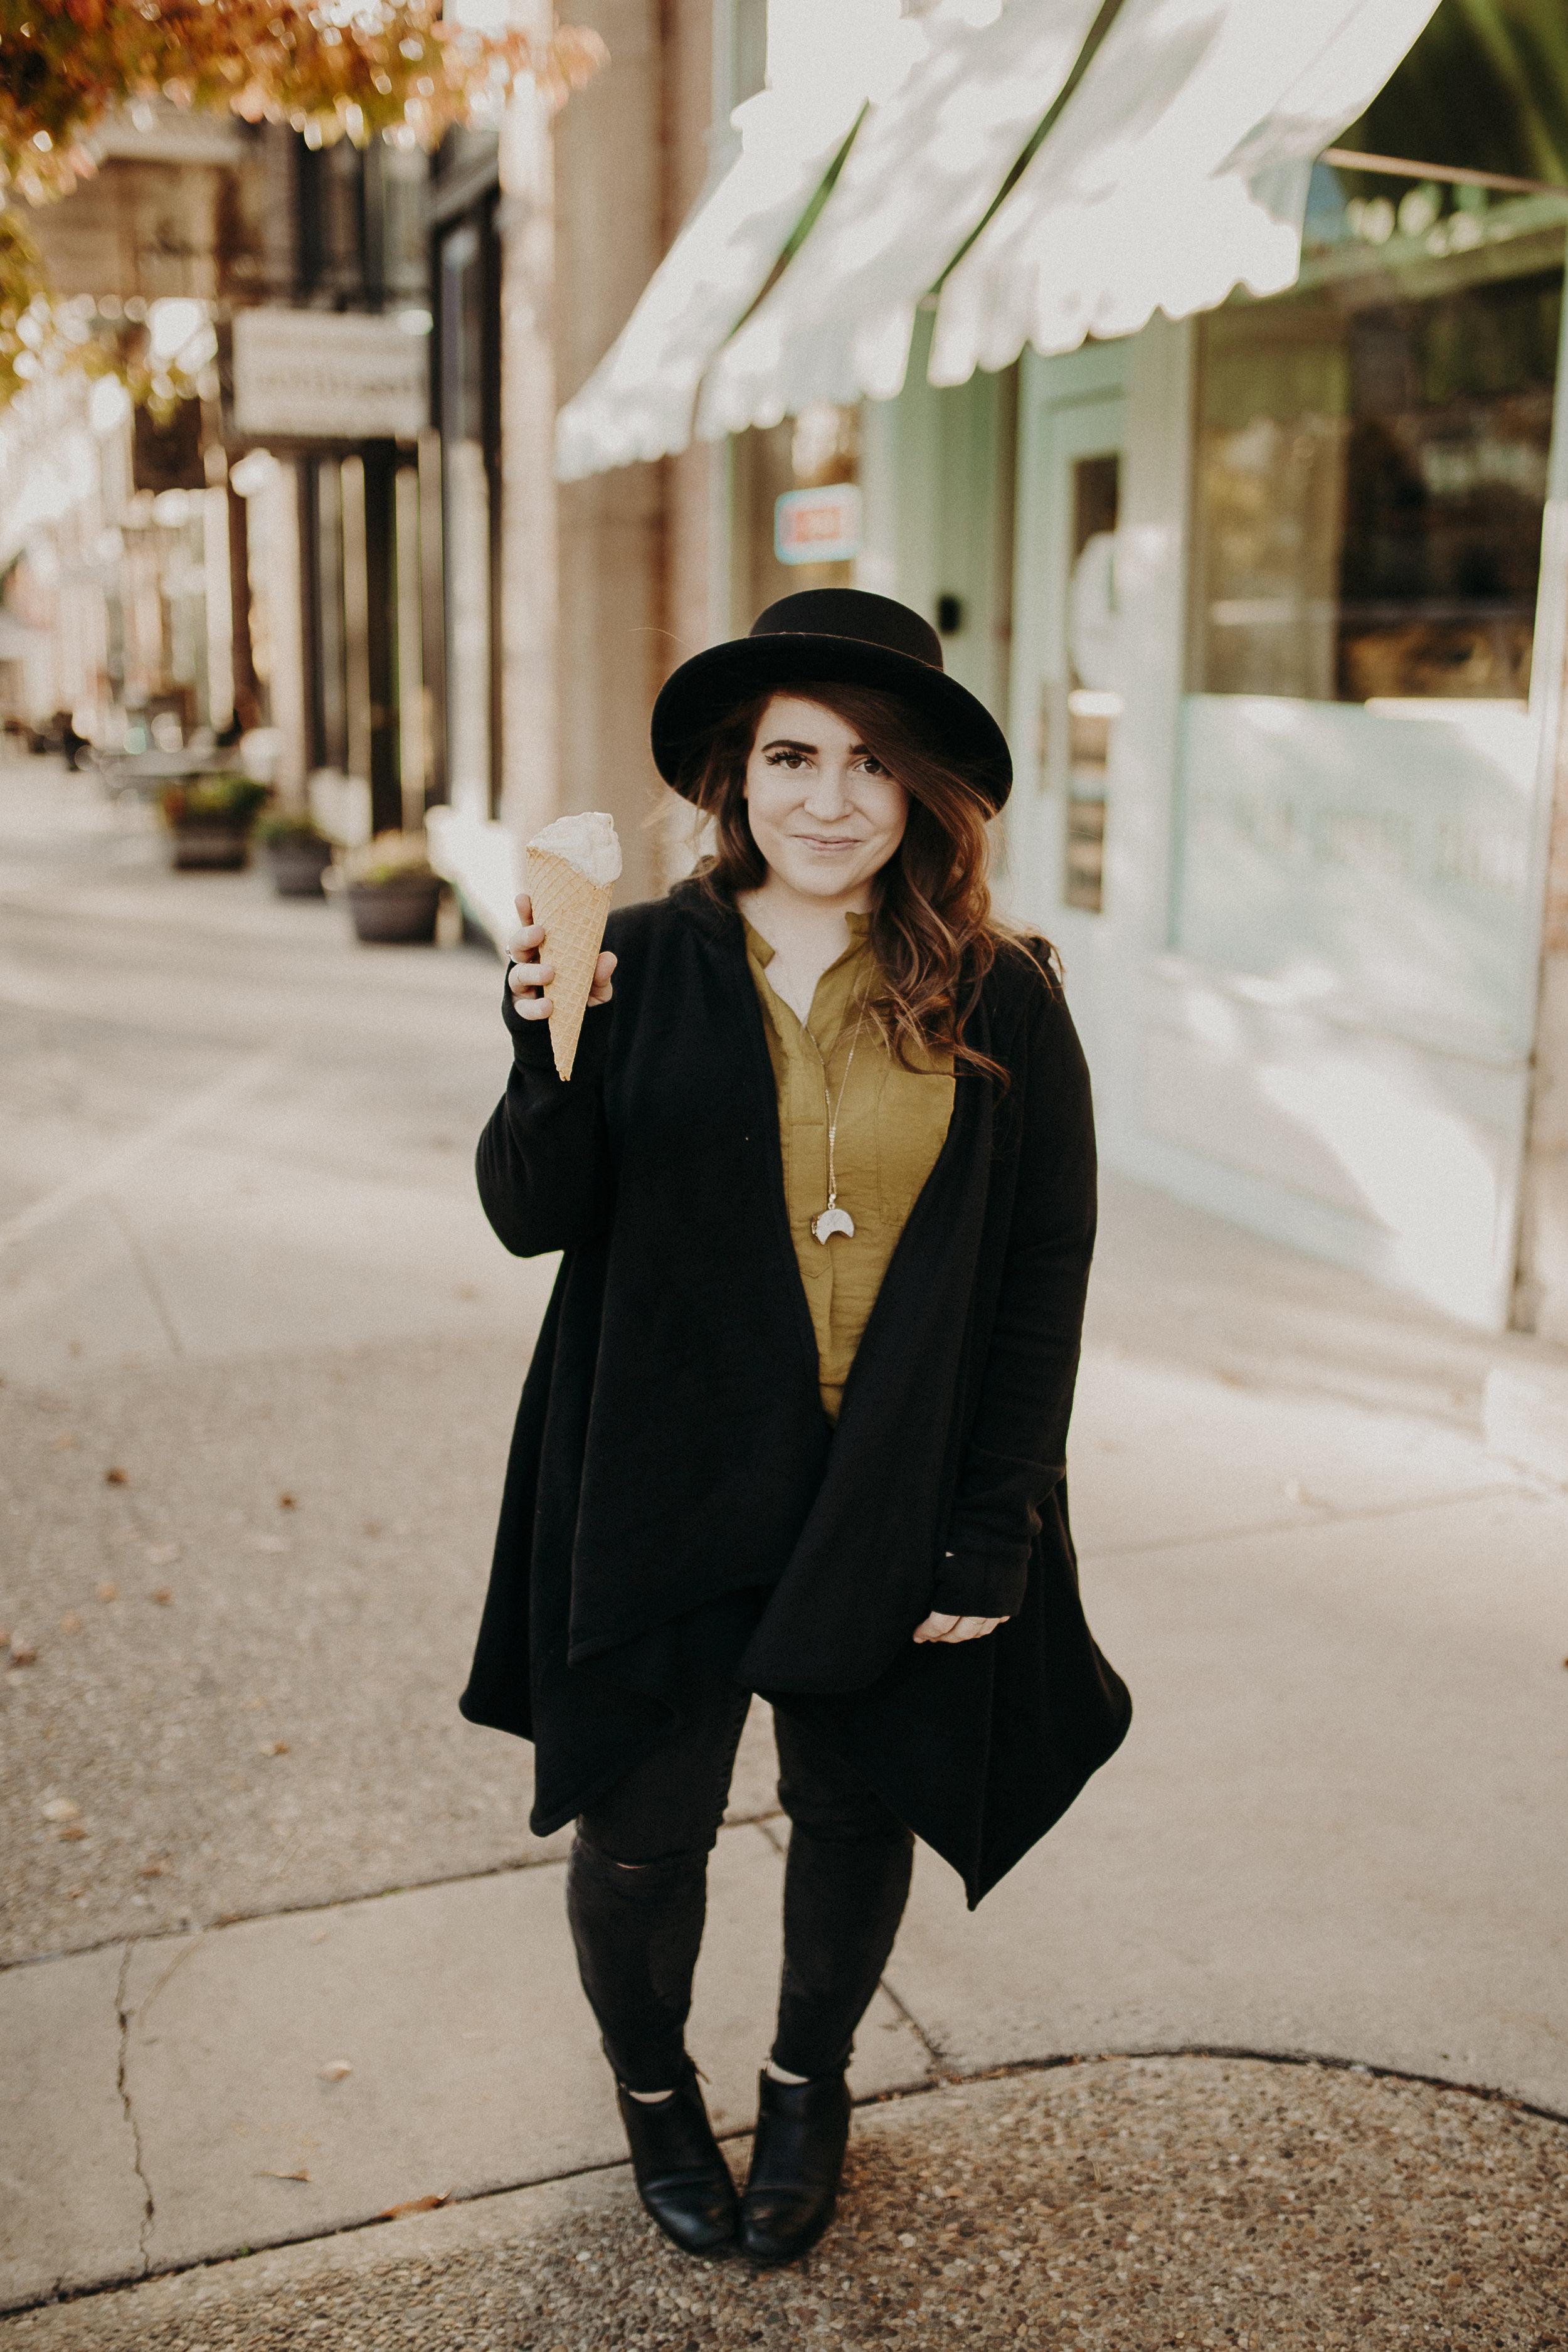 fall-outfit-ideas-9.jpg